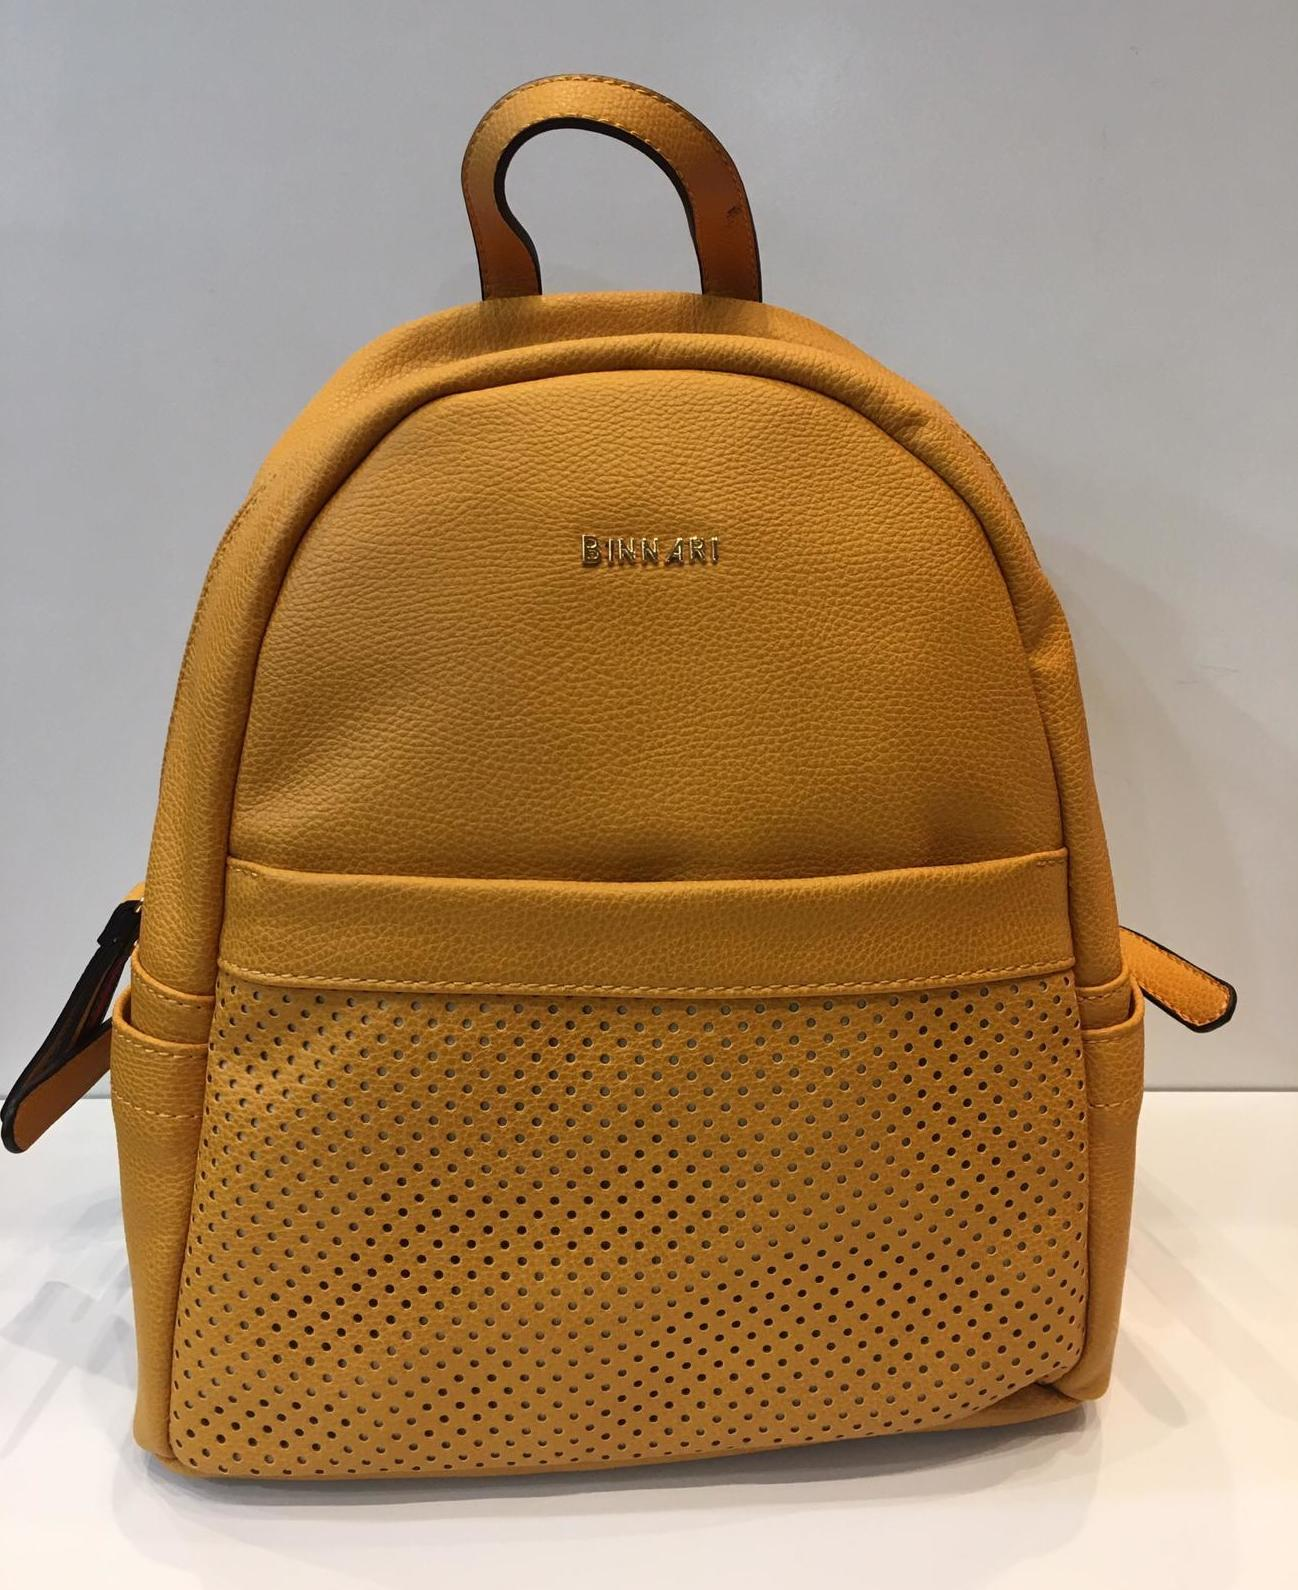 mochila marca Binnari